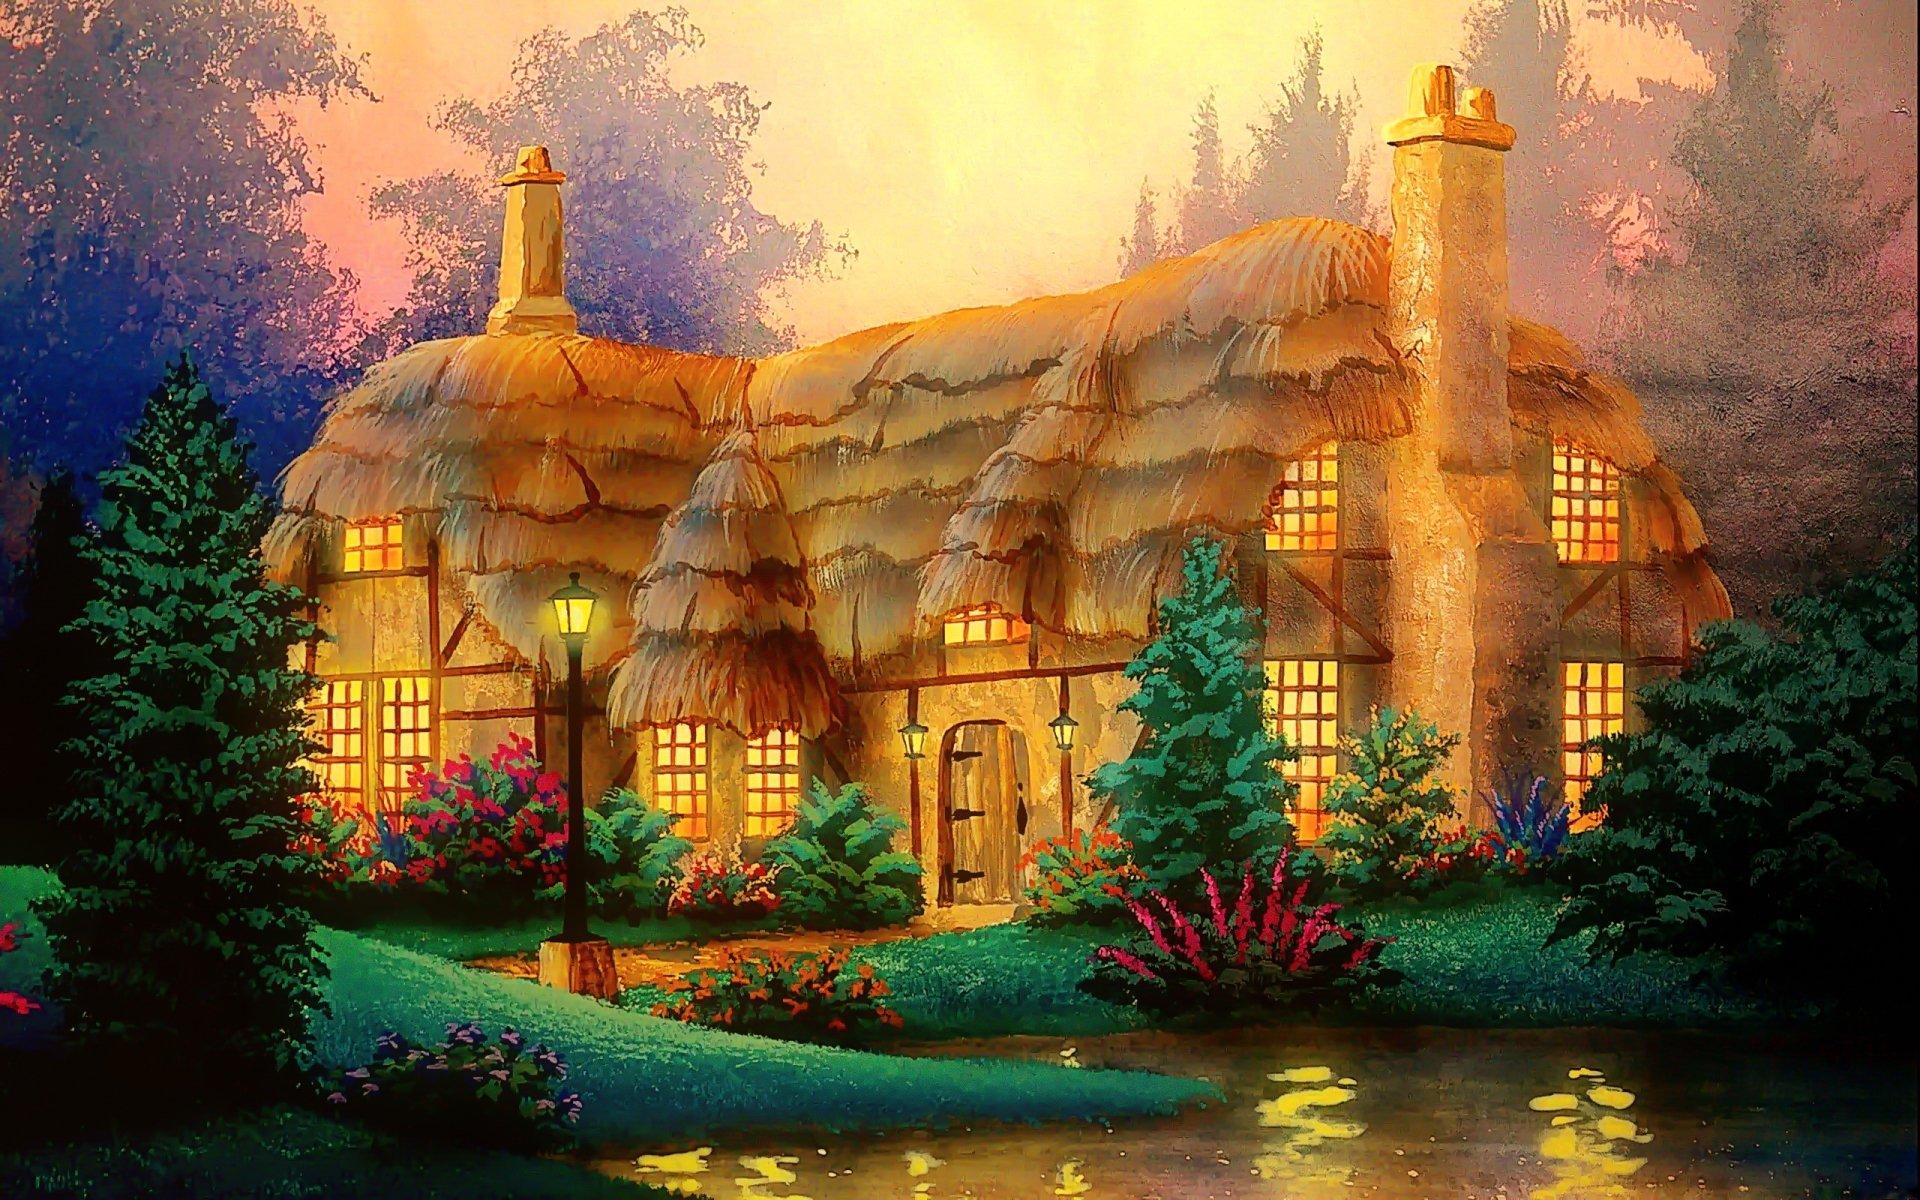 Artistic - House  Artistic Cottage Magical Landscape Colorful Wallpaper